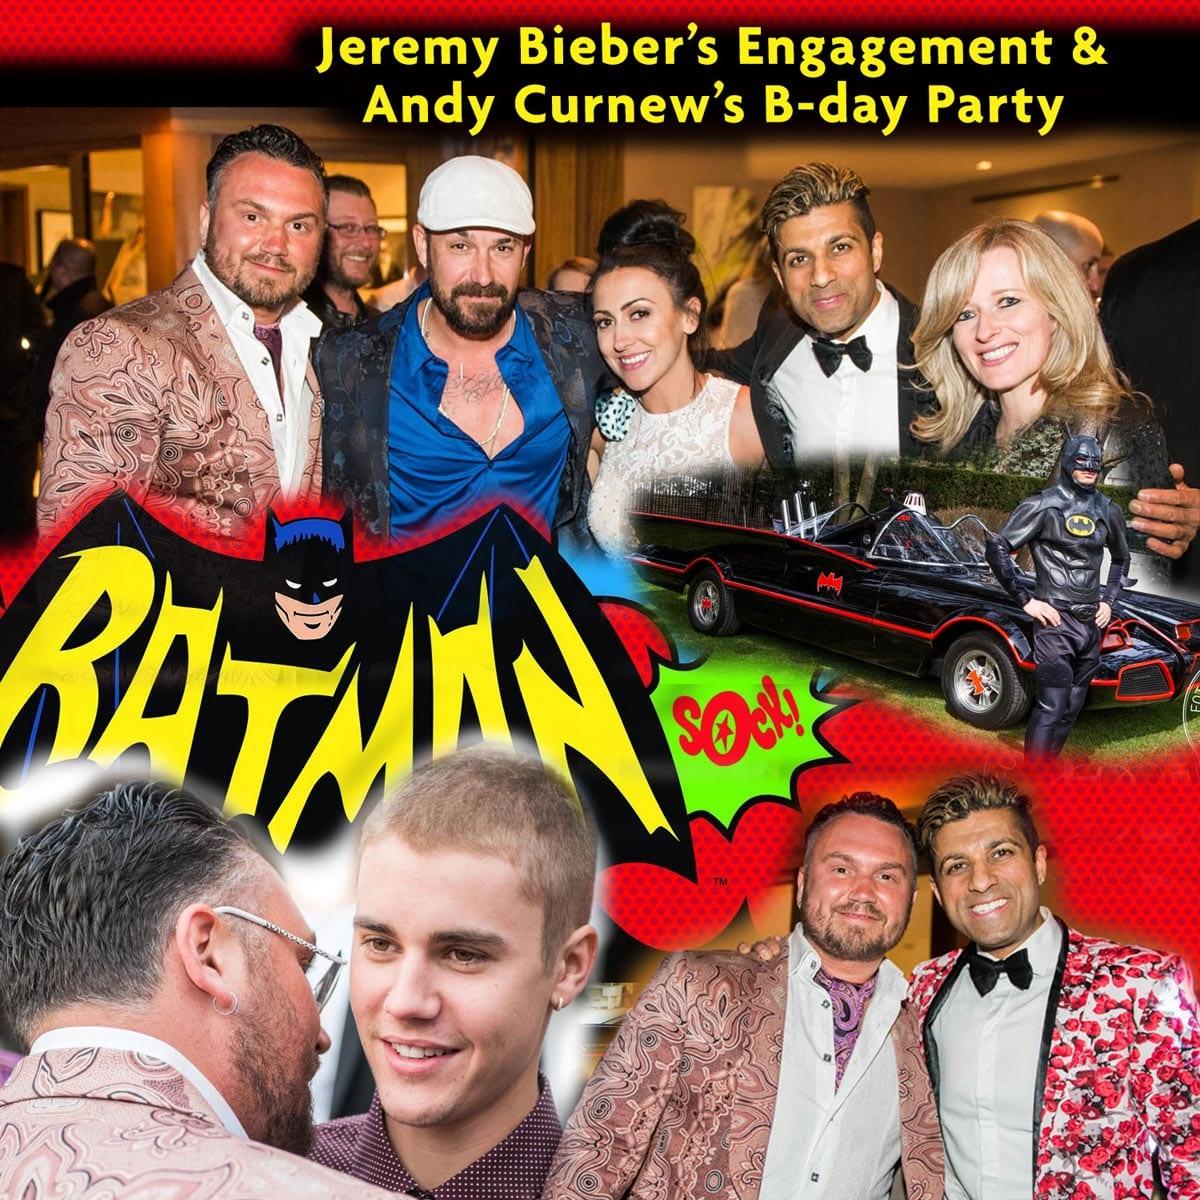 Bieber Party